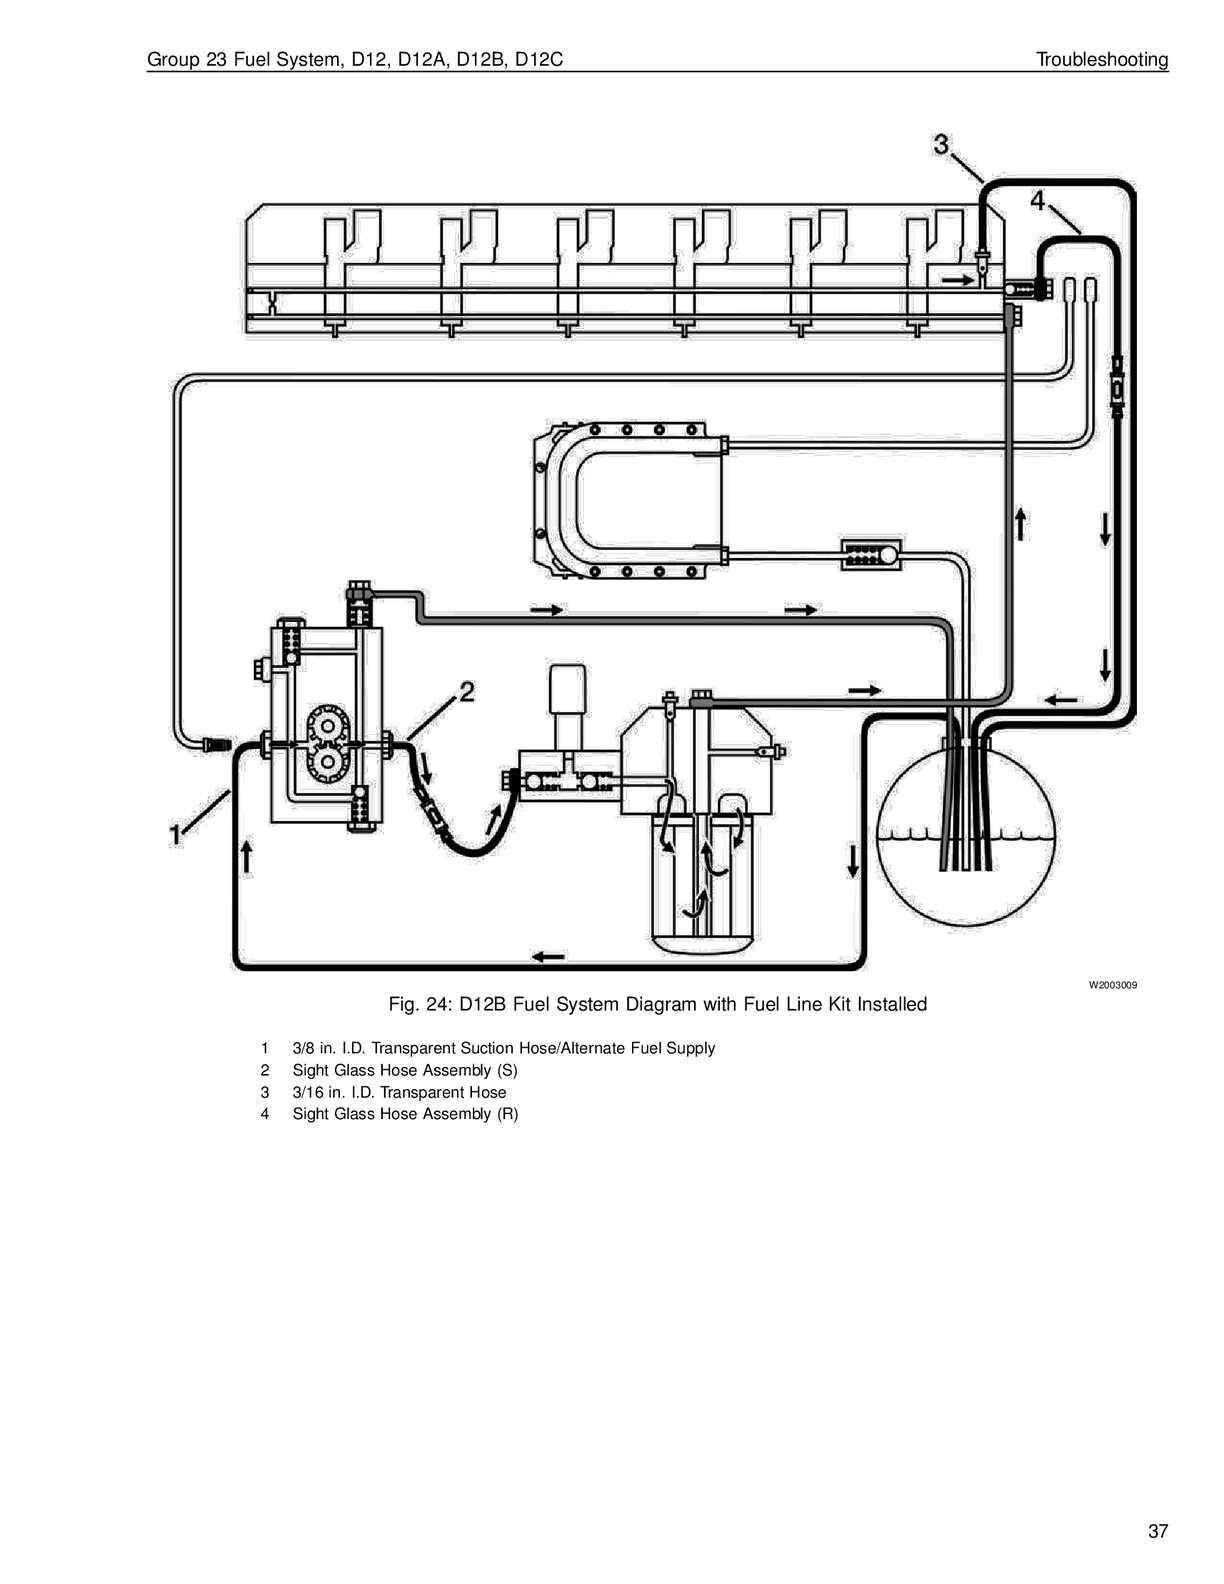 Volvo Fuel Pump Diagram - Wiring Diagram Direct pen-stereotype -  pen-stereotype.siciliabeb.it   Volvo Fuel Pump Diagram      pen-stereotype.siciliabeb.it